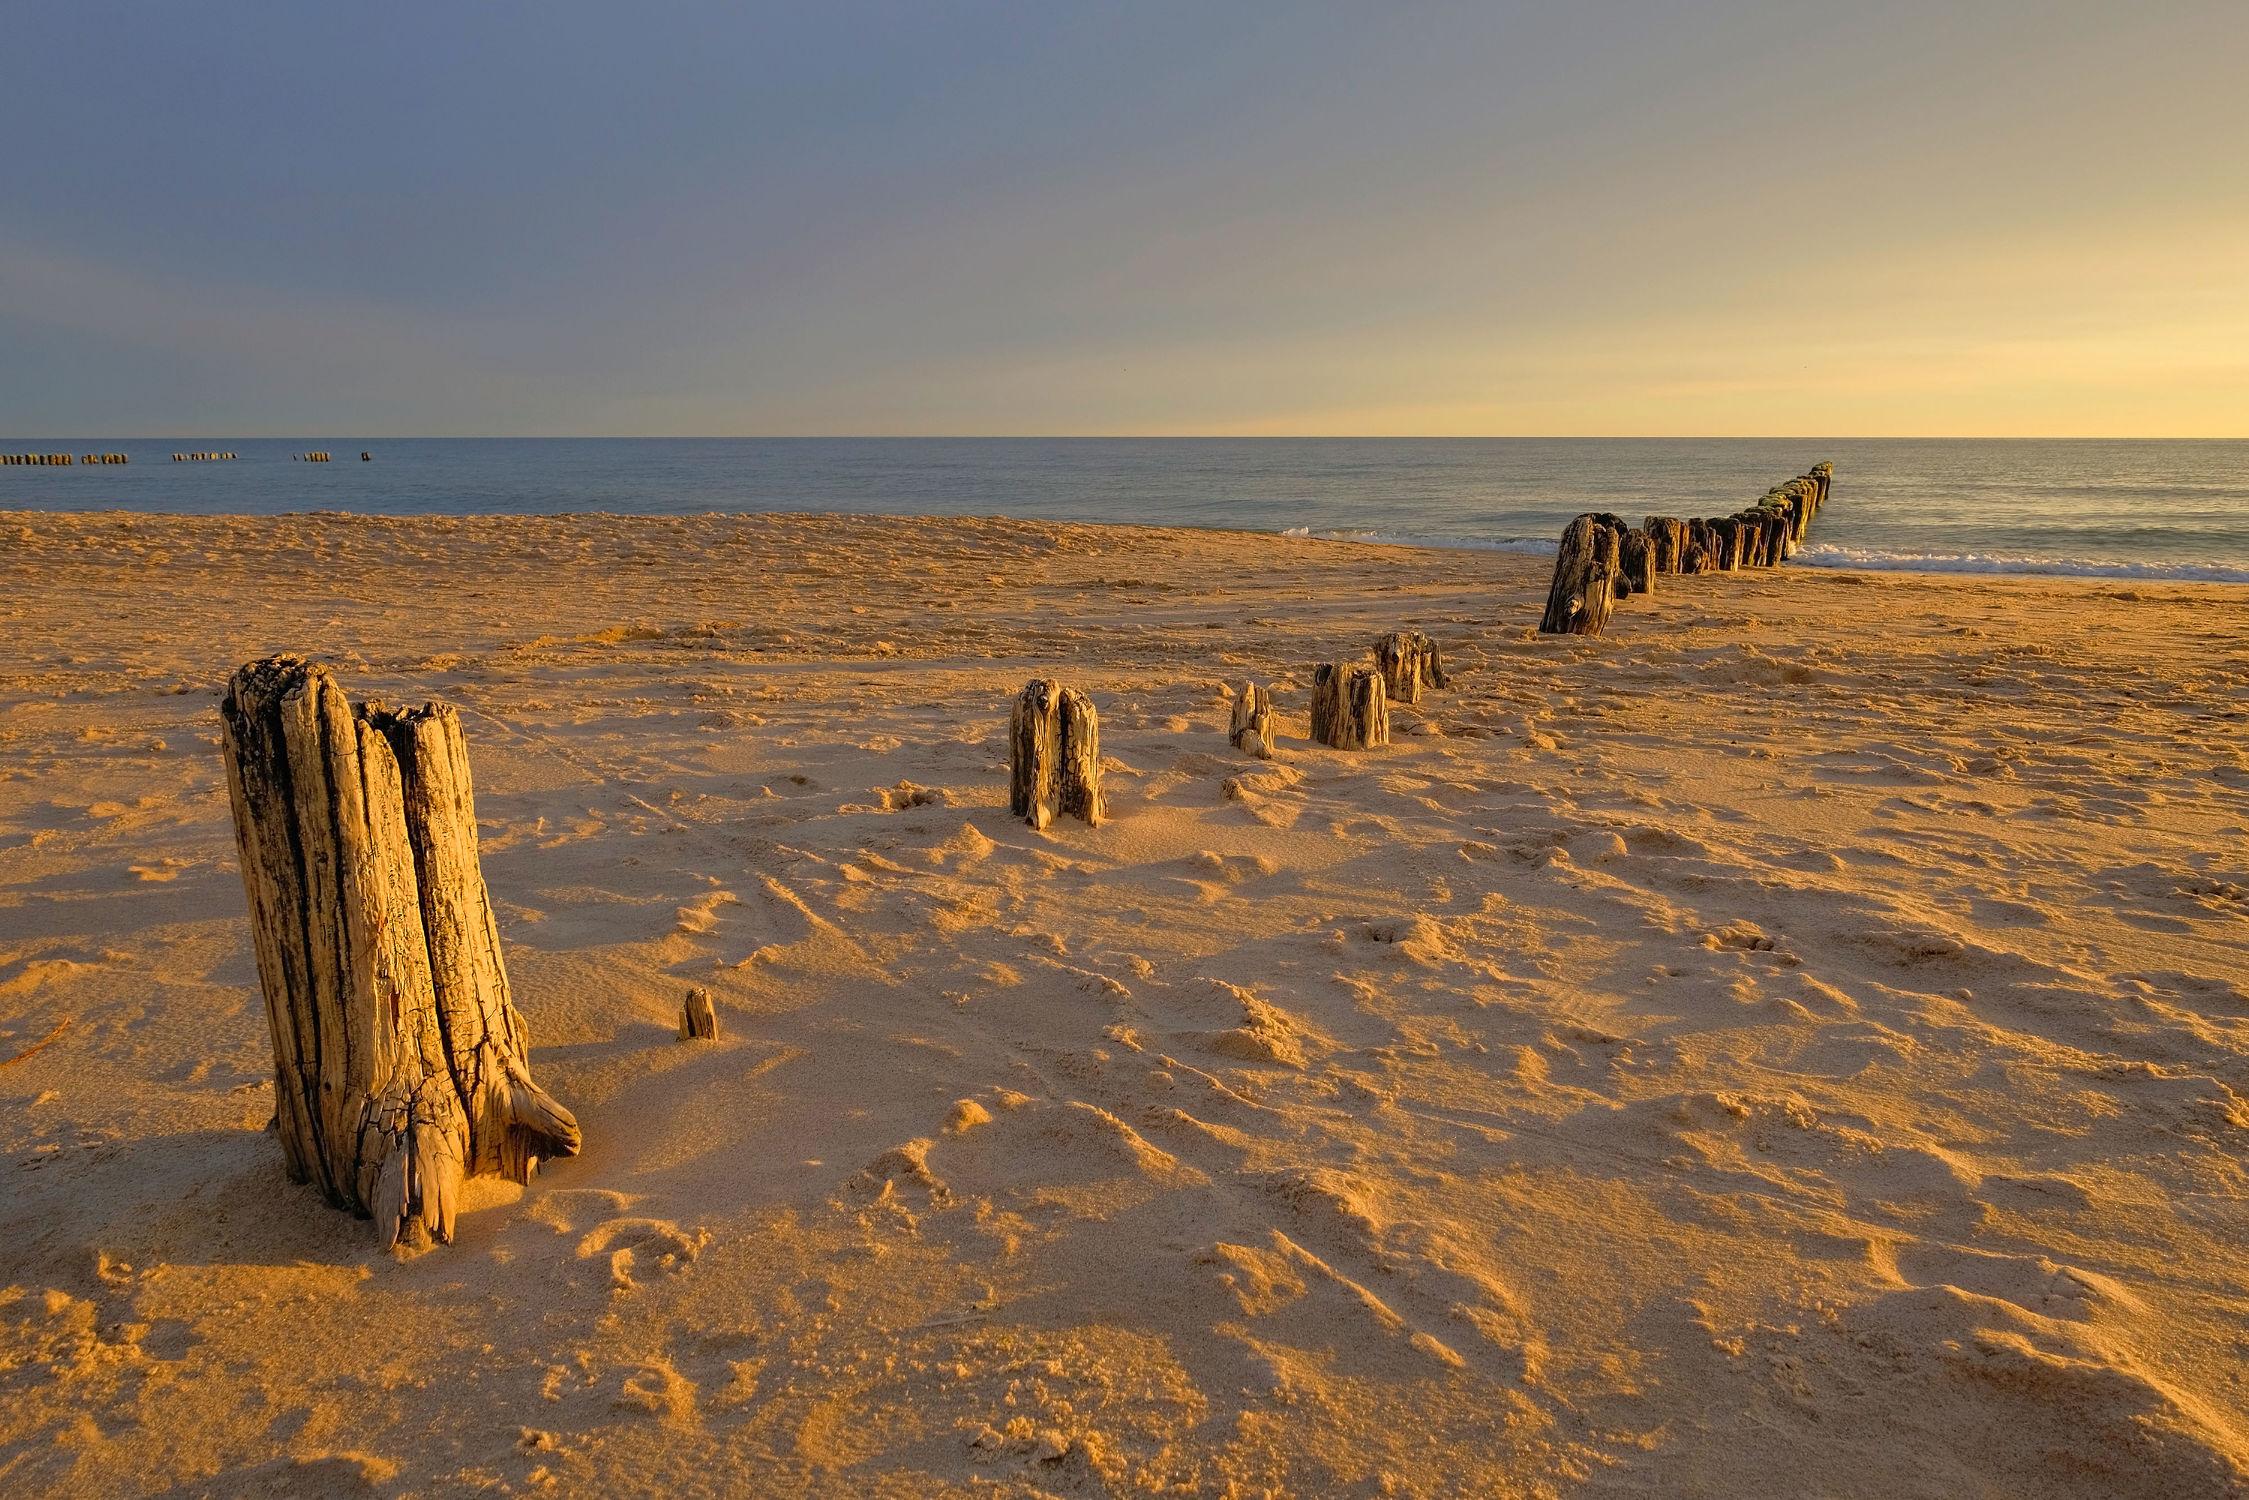 Bild mit Himmel, Sonnenuntergang, Sonnenaufgang, Sonne, Strand, Meerblick, Meer, Küste, Am Meer, Abendsonne, Buhnen, Abendidylle